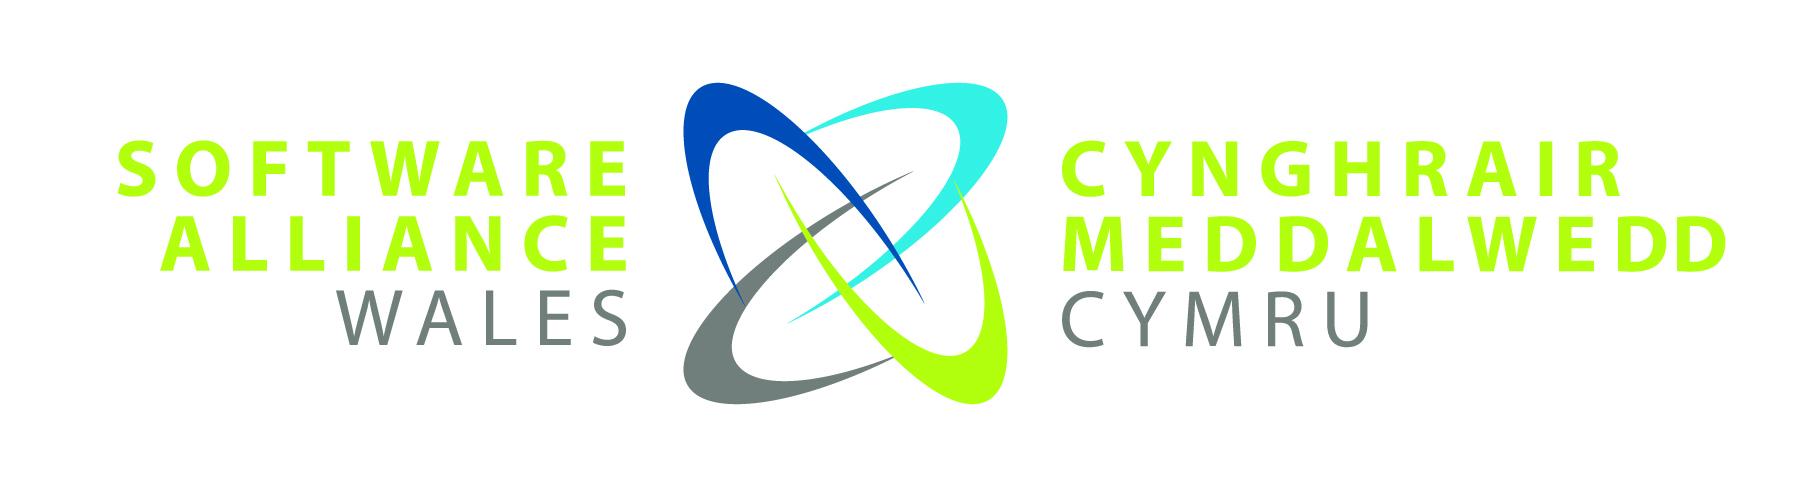 Software Alliance Wales logo